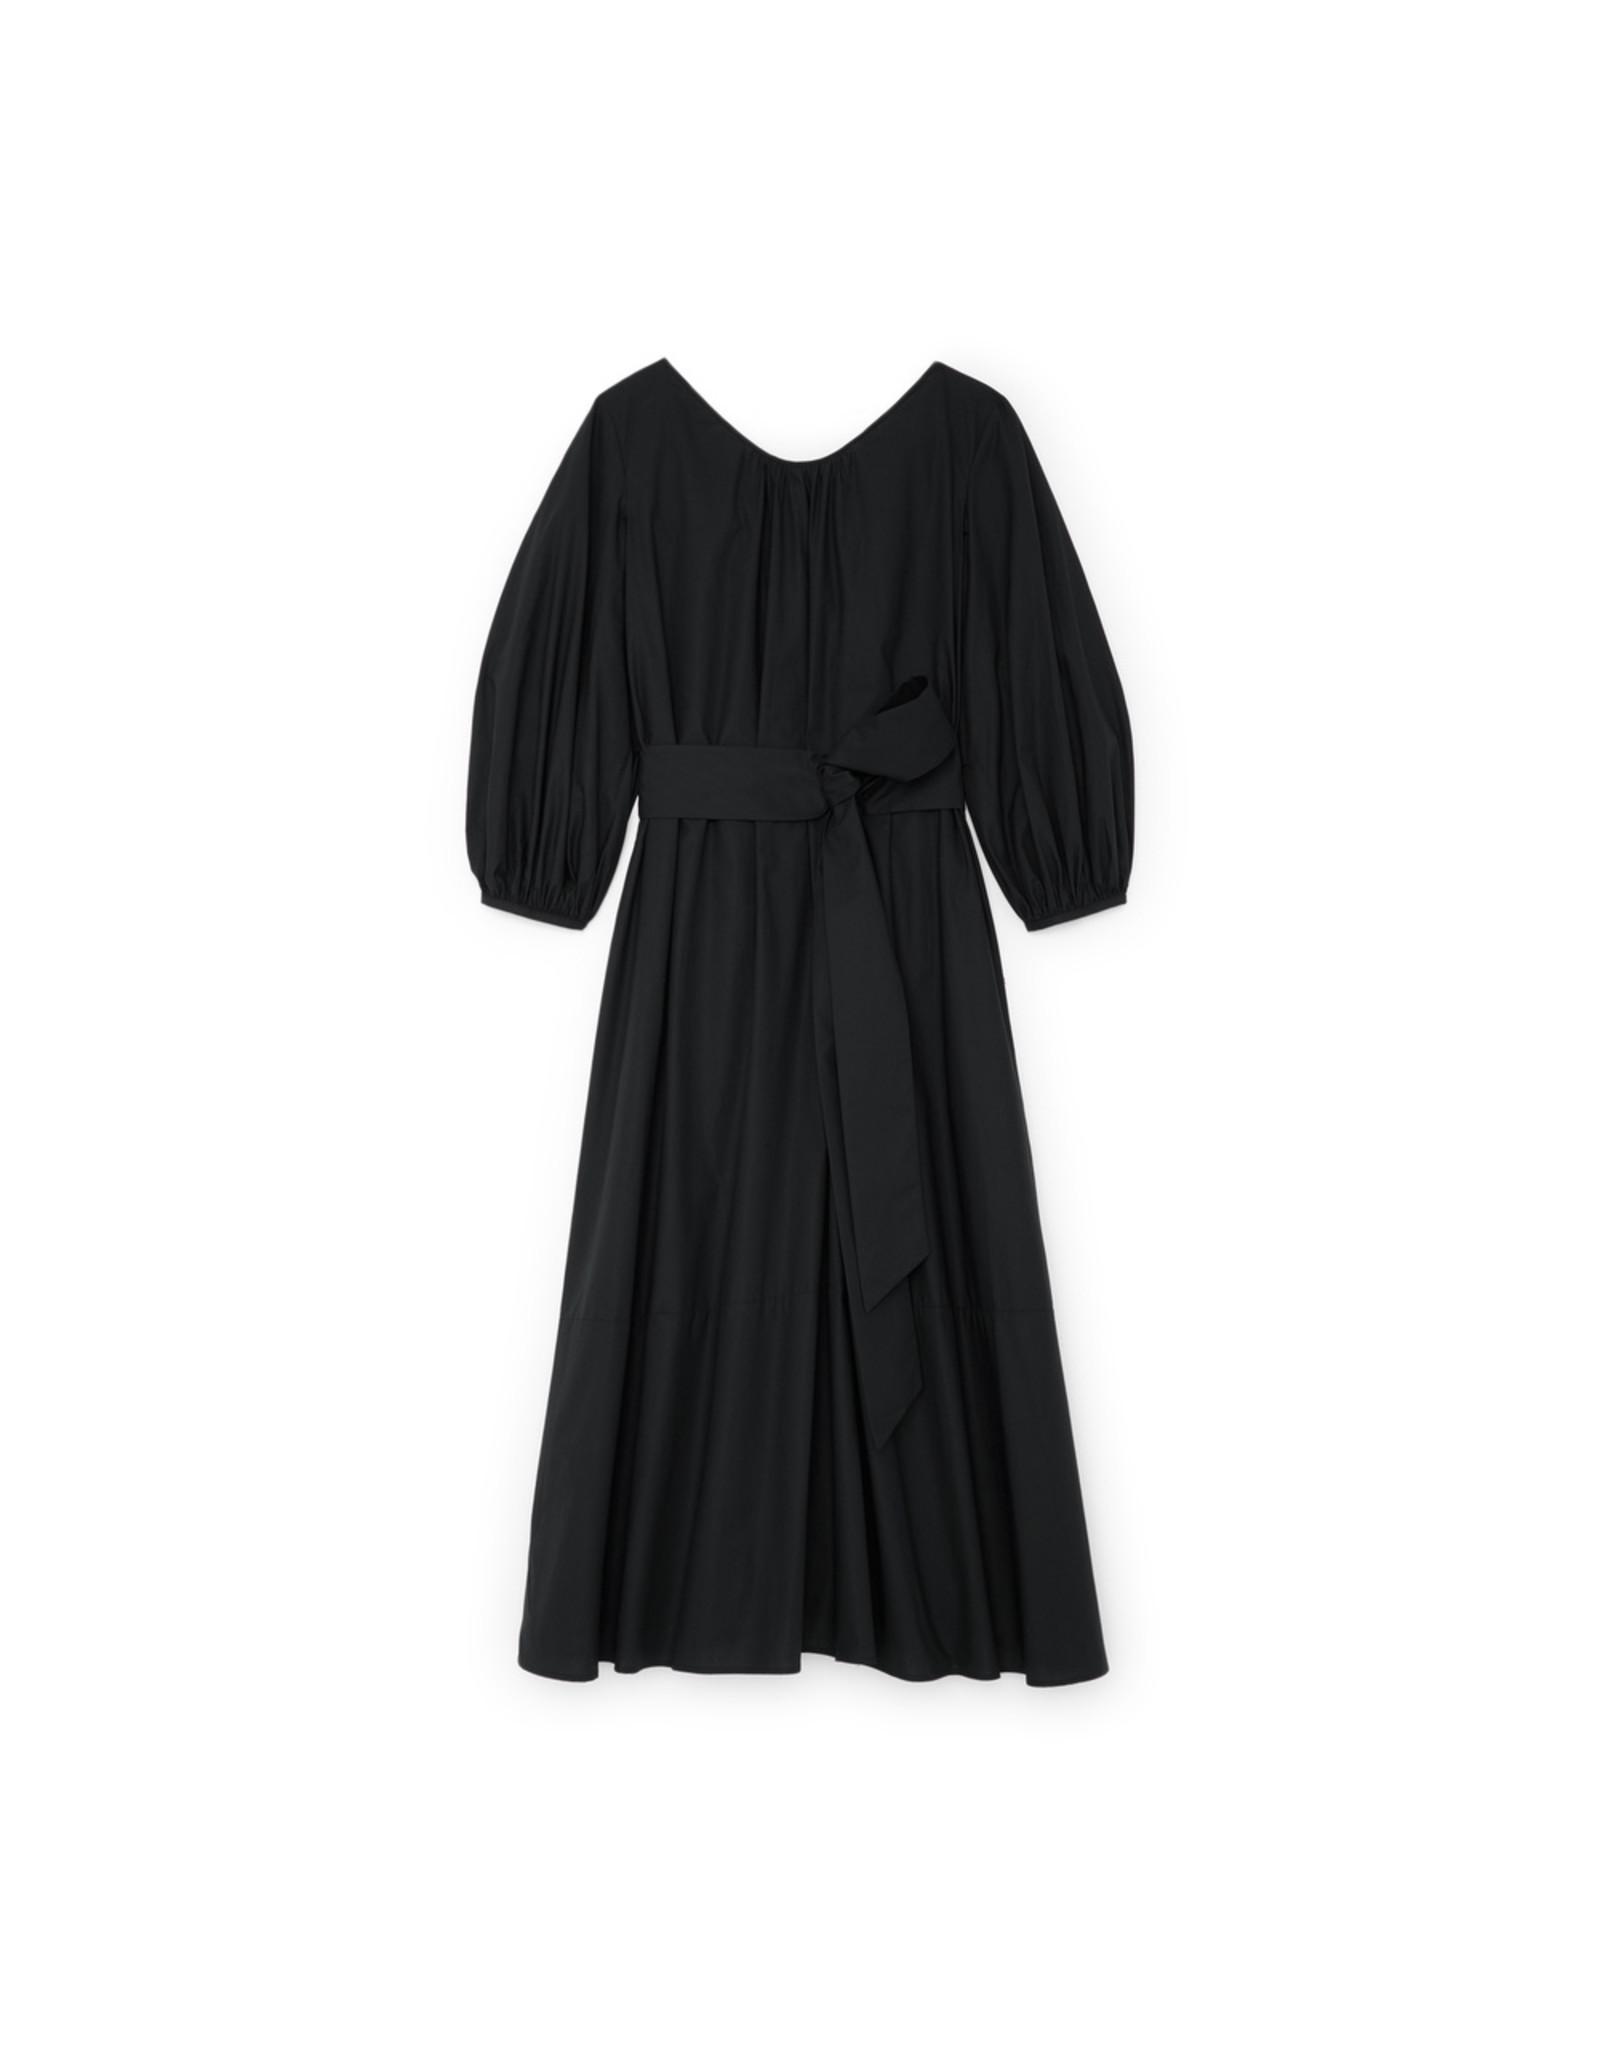 G. Label G. Label Amagansett Maxi Dress (Color: Black, Size: S)